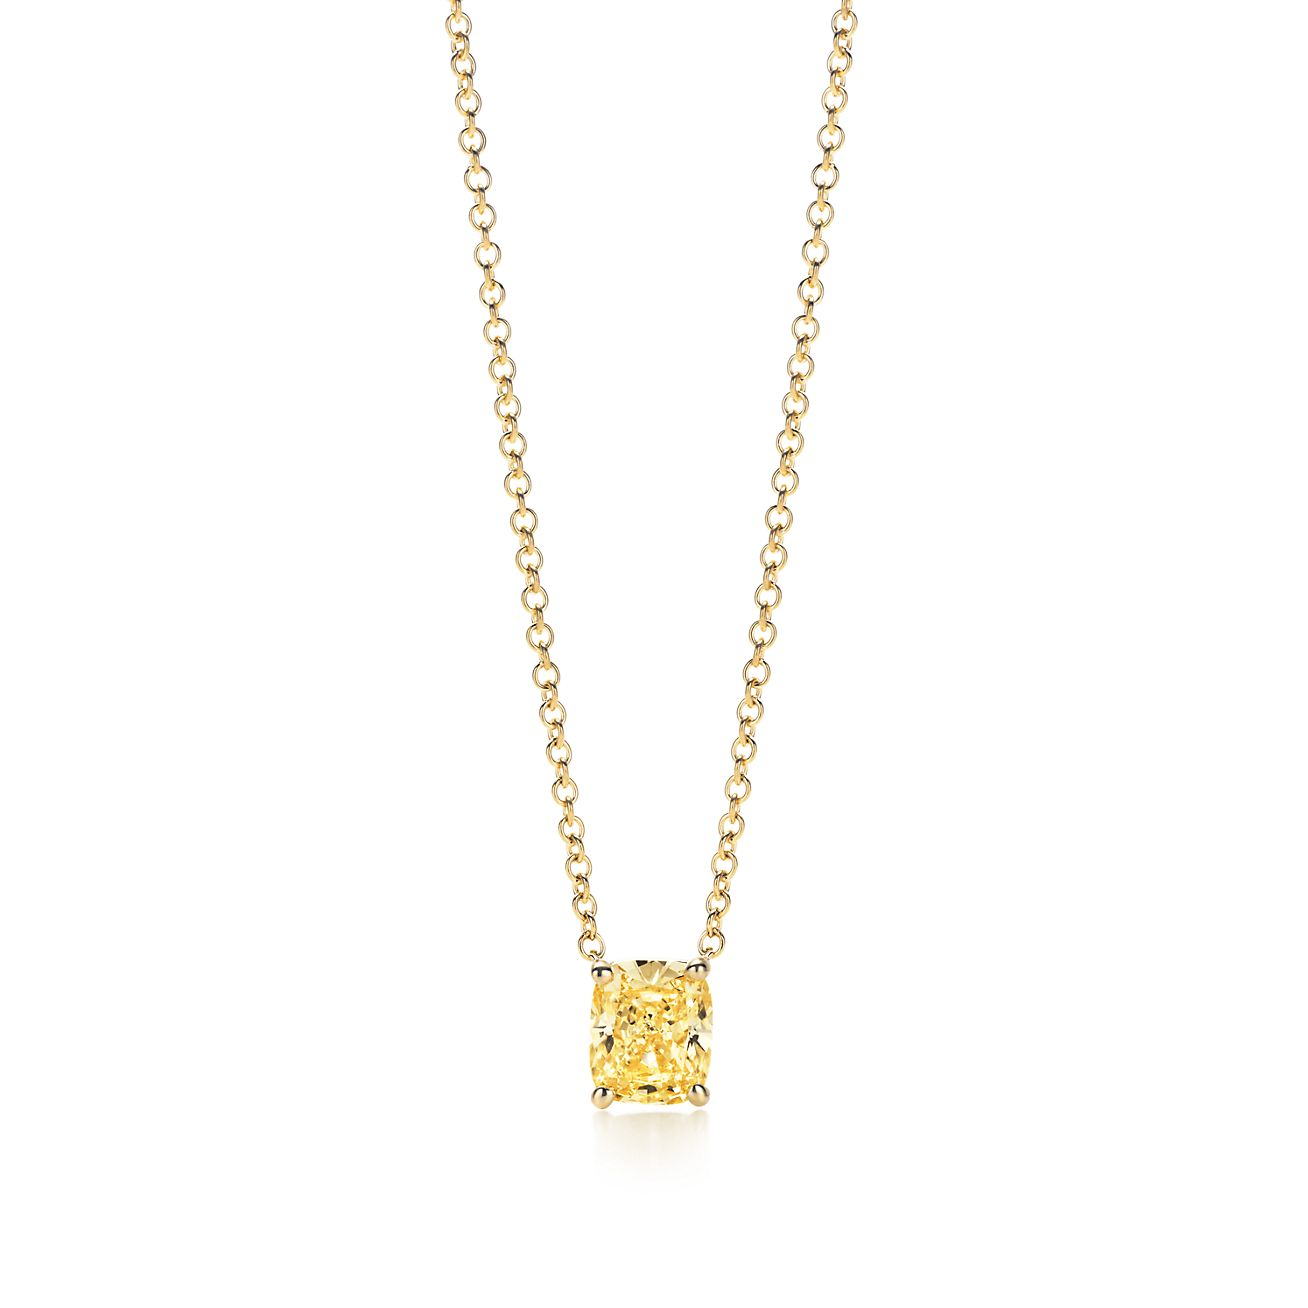 Tiffany cushion cut yellow diamond pendant tiffany co cushion cut yellow diamond pendant mozeypictures Images